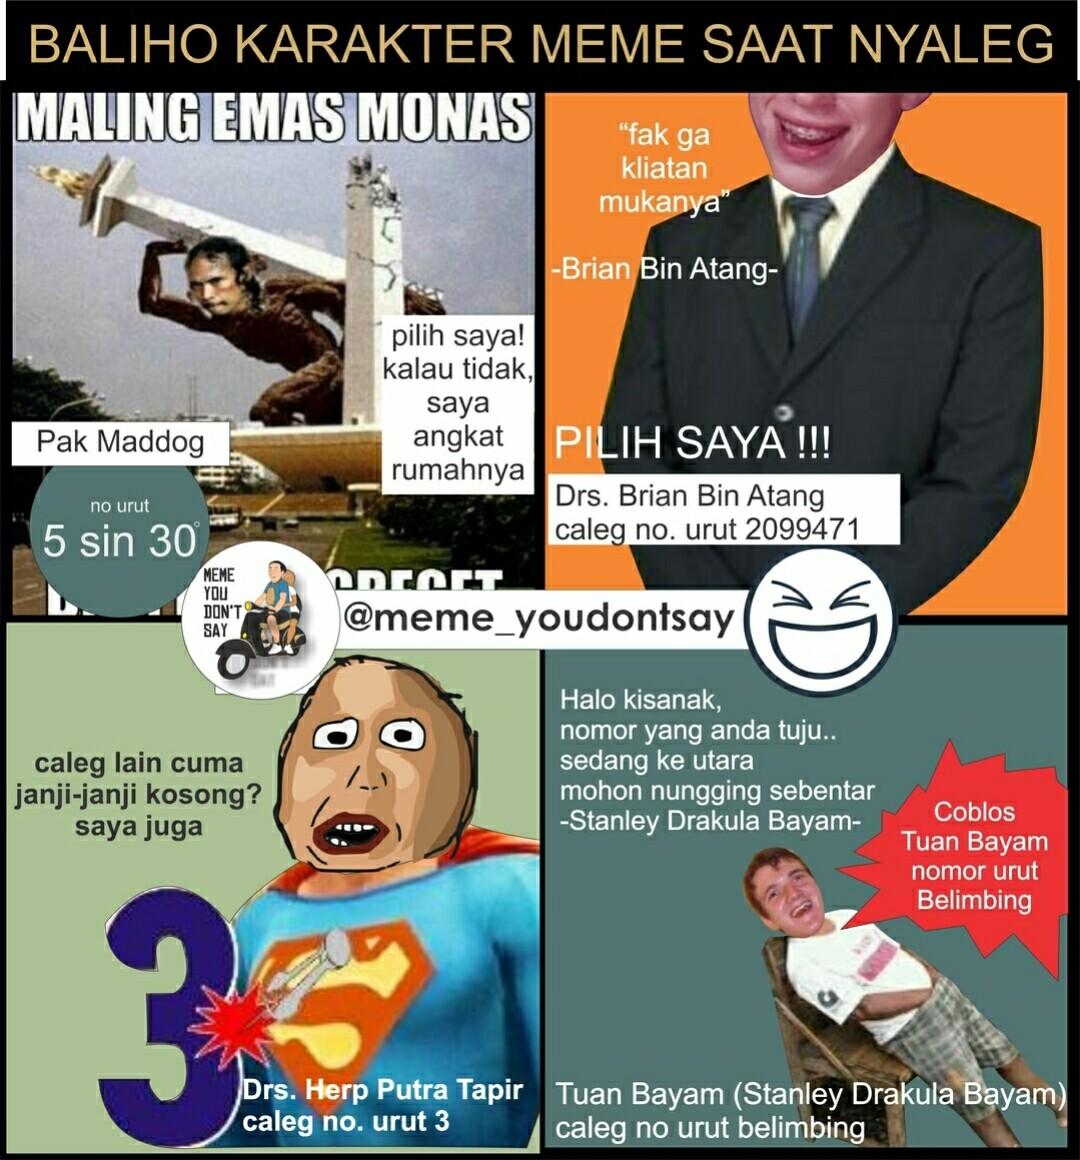 Koleksi Gambar Tokoh Meme Polosan  Gambar Meme